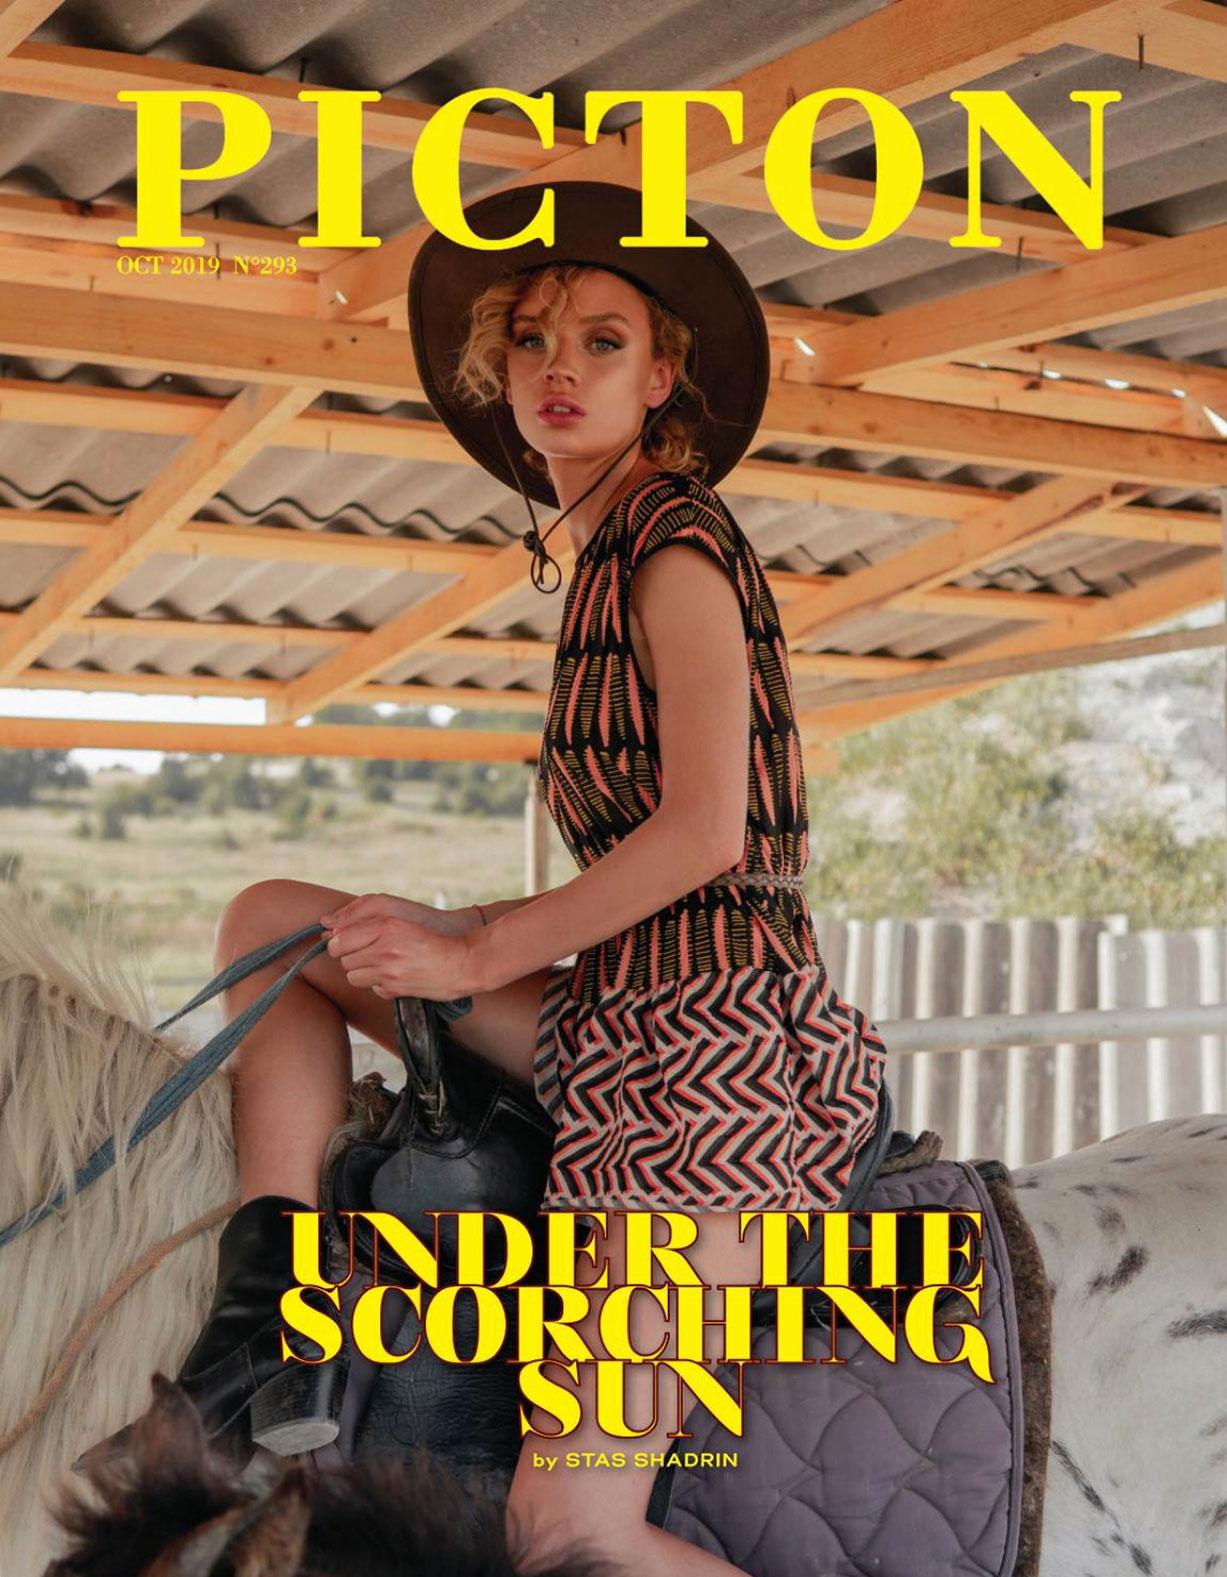 Девушка и лошадь / Даша Степанова в журнале Picton / фото 12